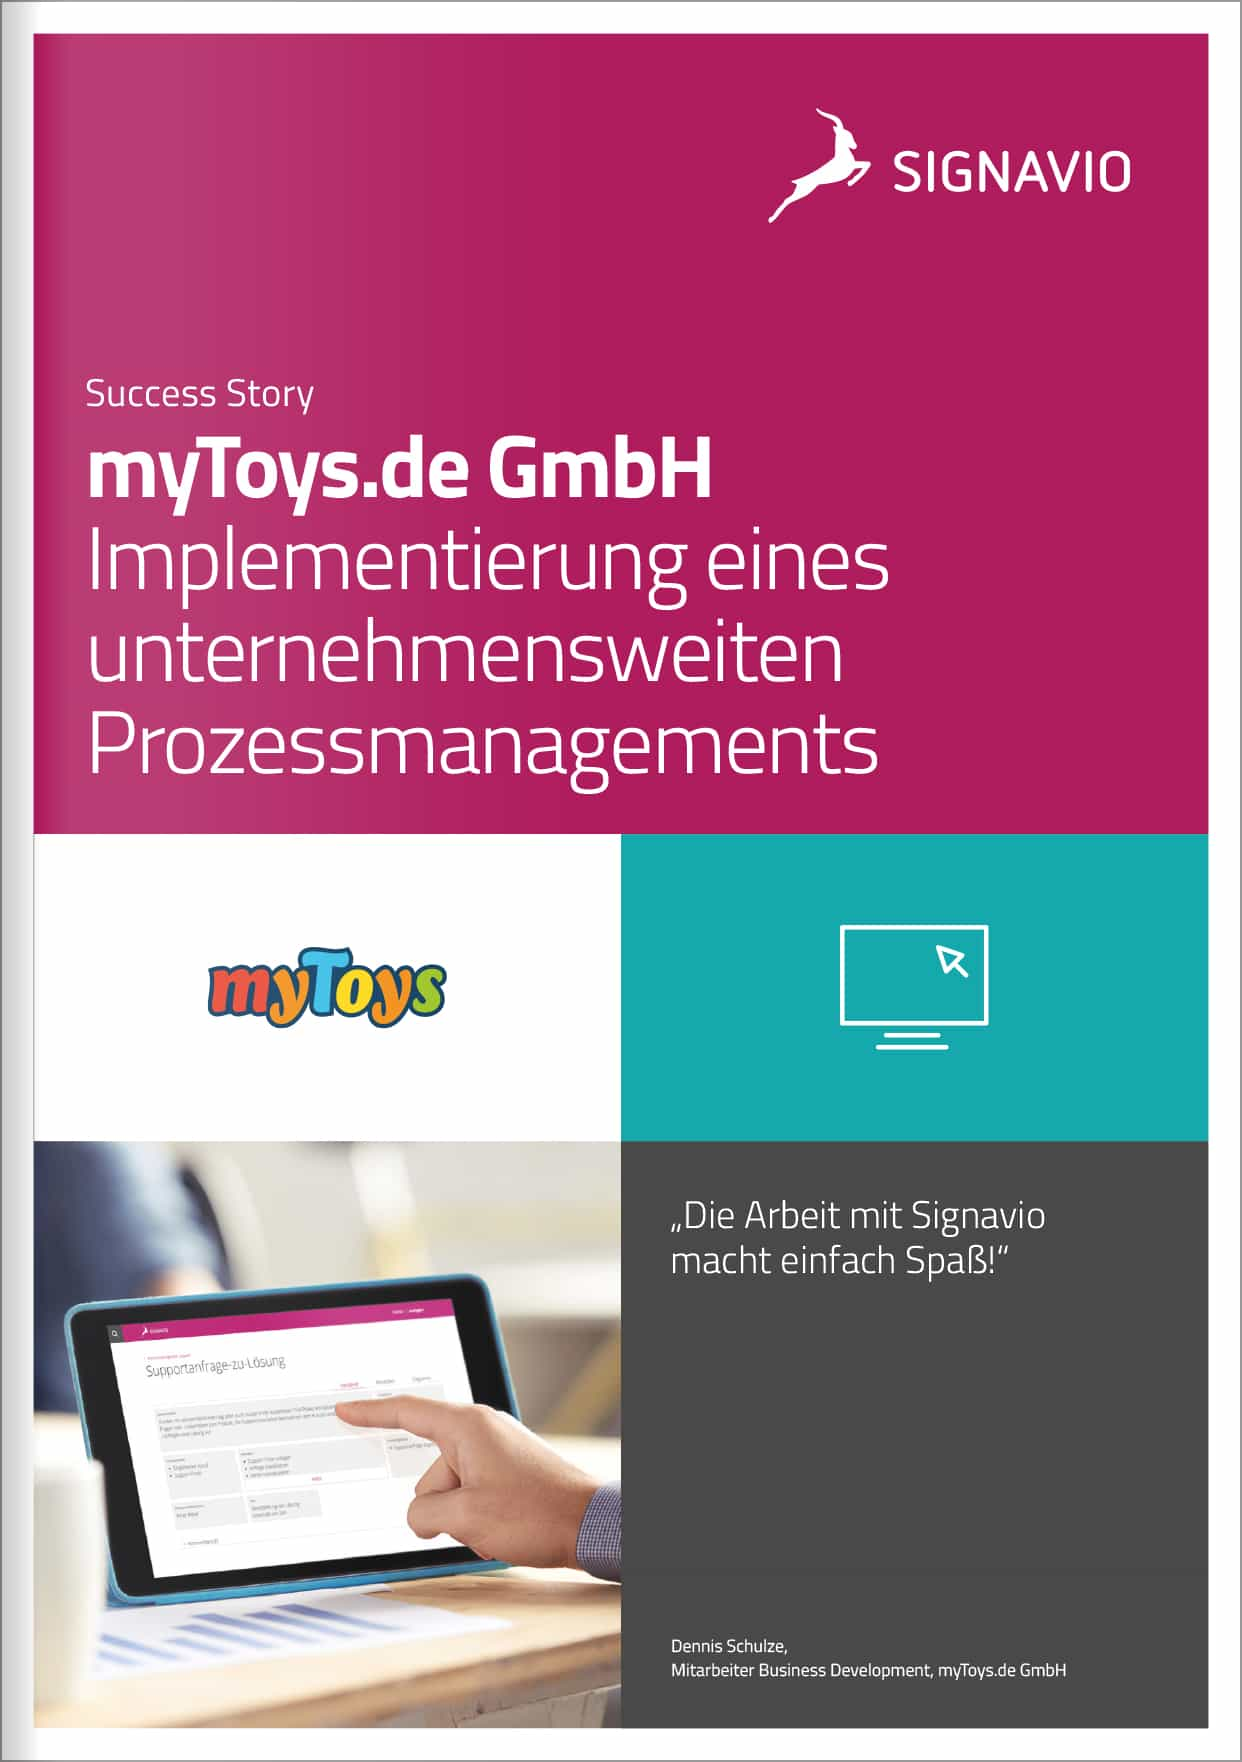 Success Story myToys.de GmbH